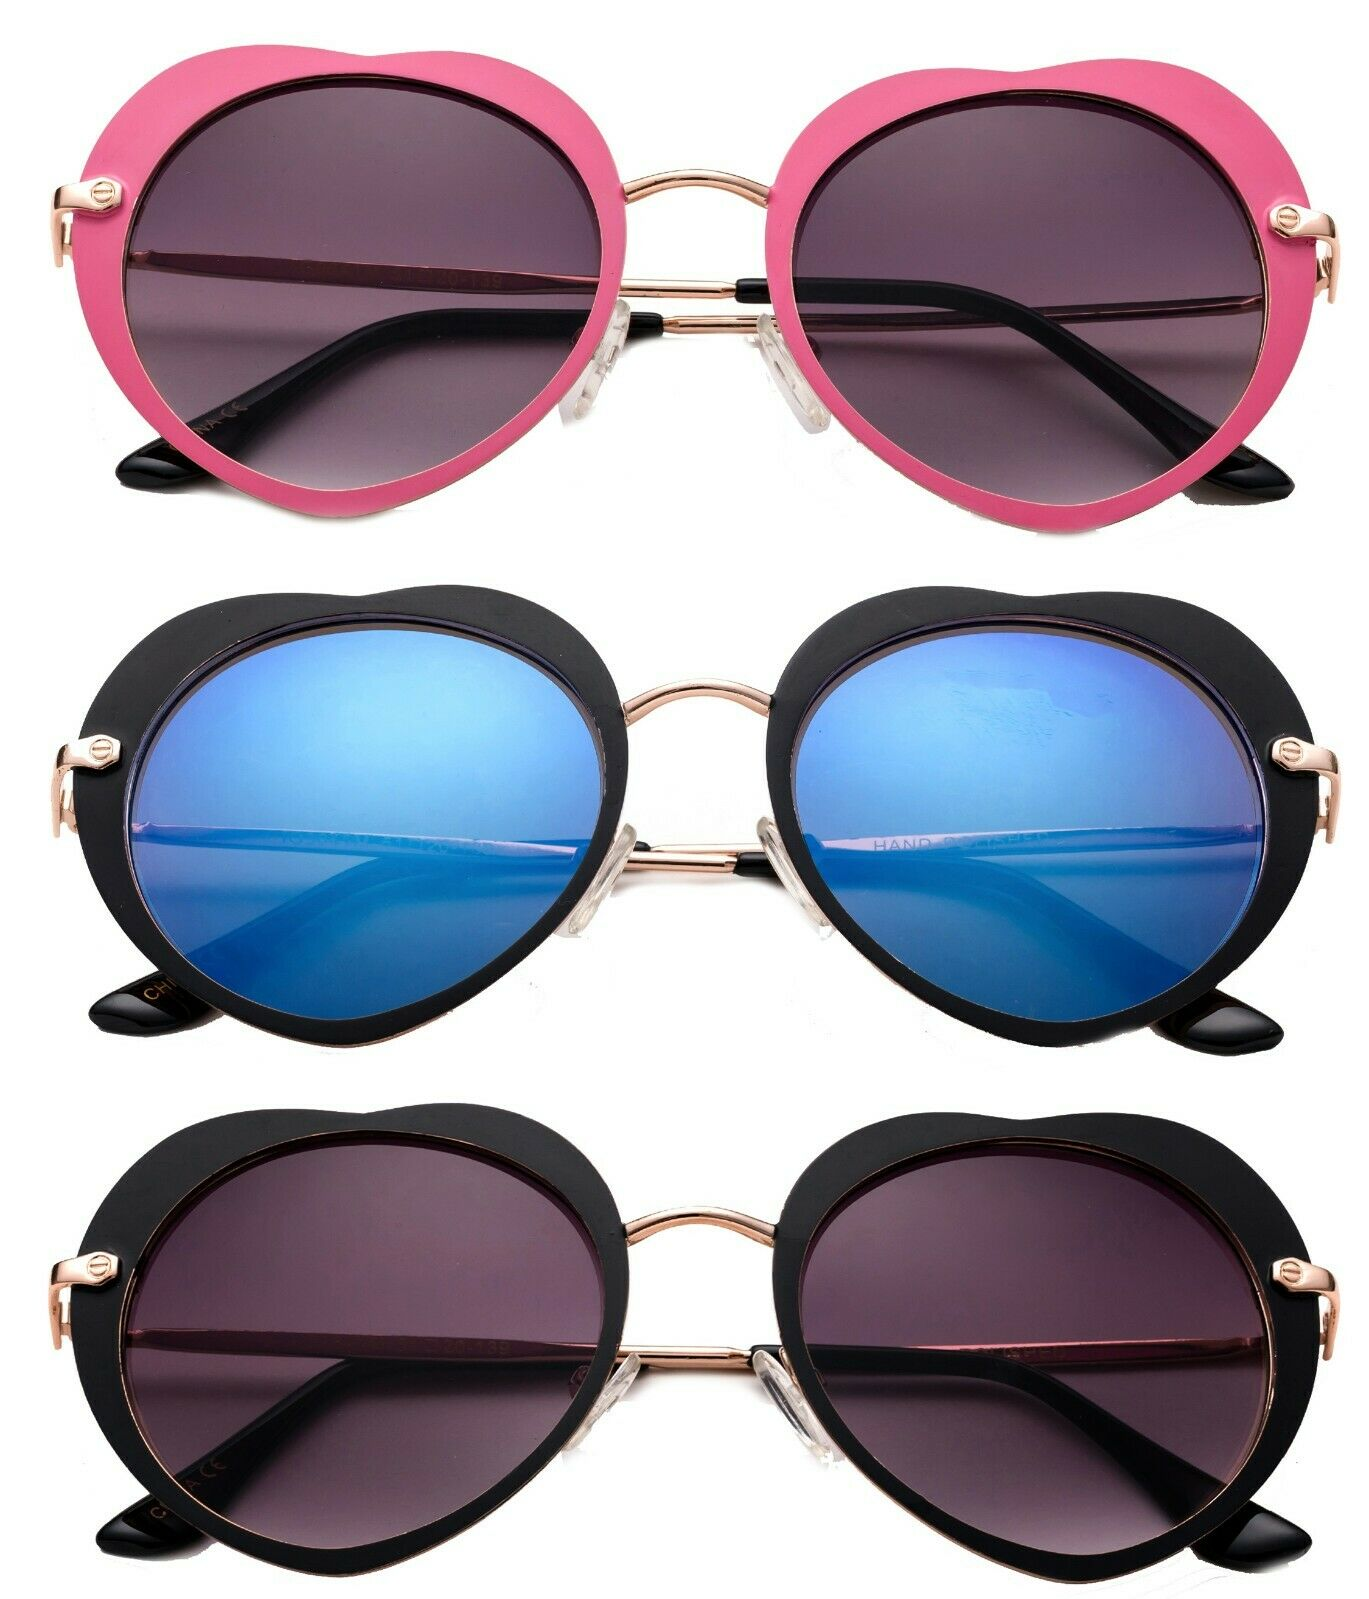 3 Pack Two Tone Metal Frame High Fashion Optical Quality Heart Shape Sunglasses